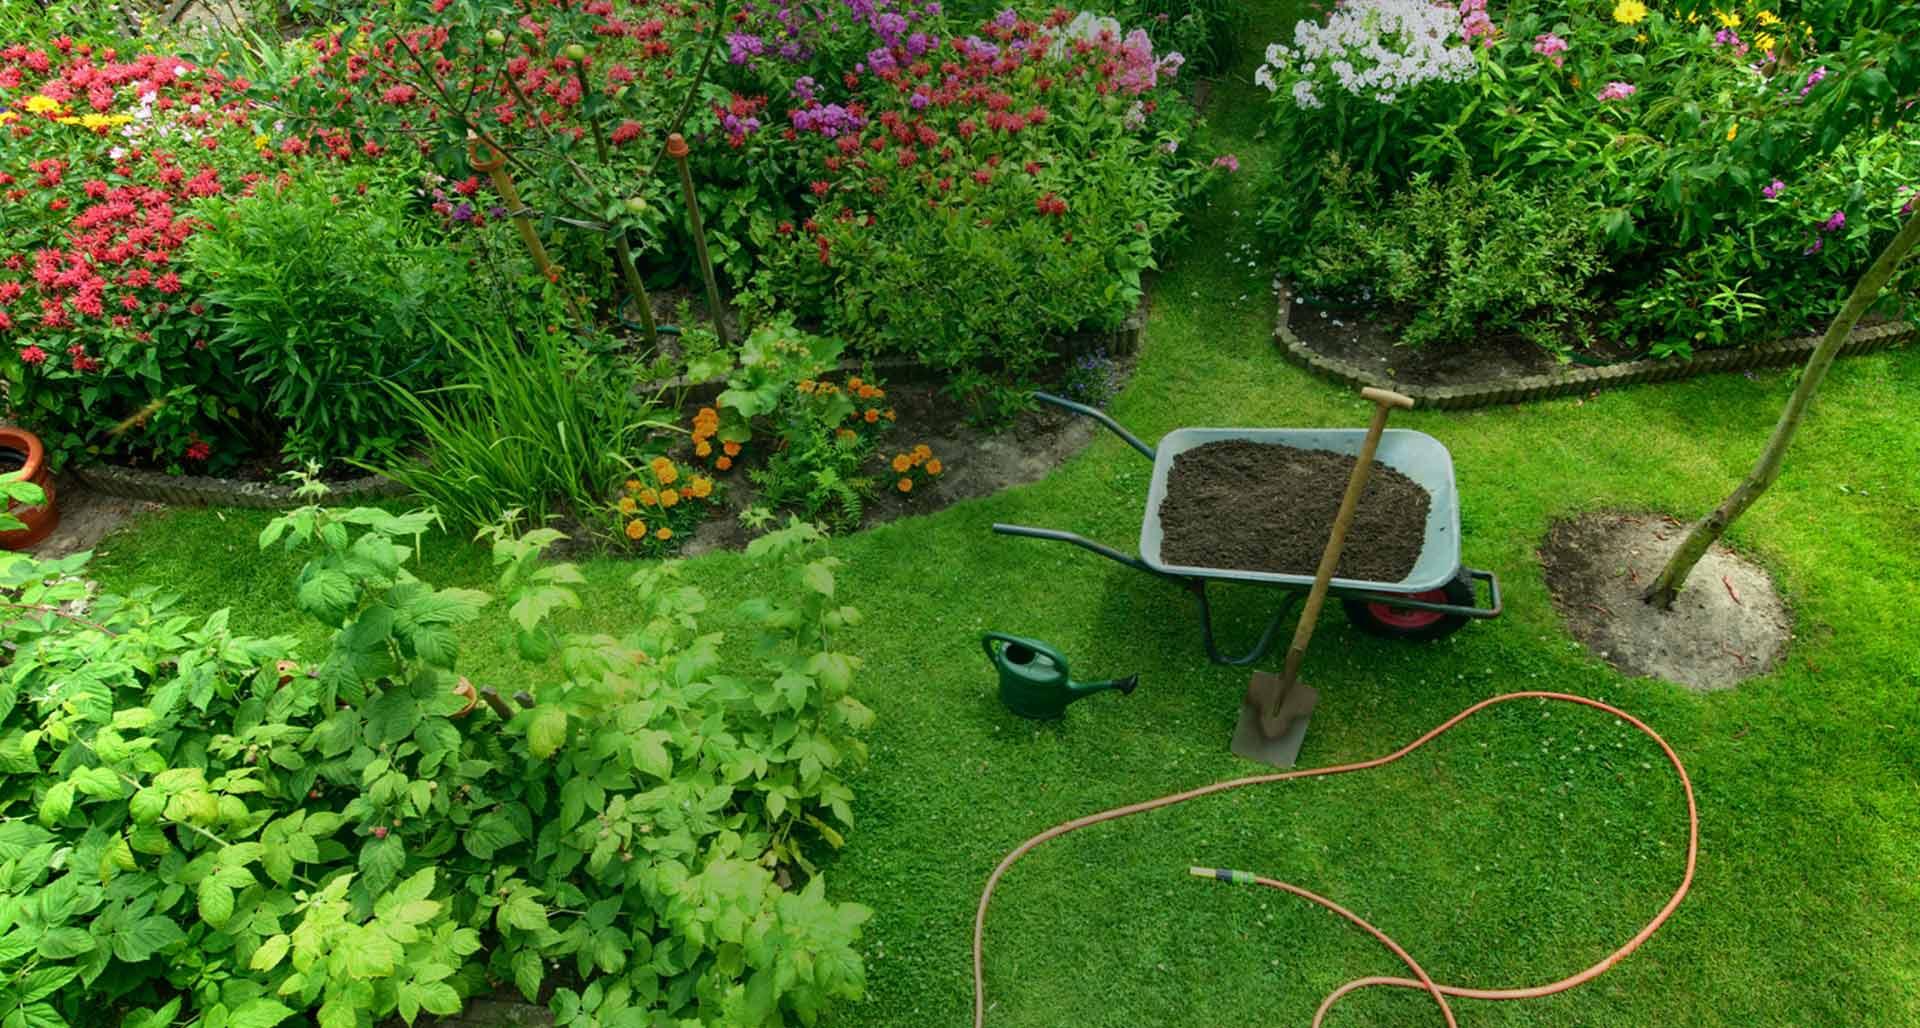 Jardineries Truffaut : Spécialiste Jardin, Animaux, Maison ... destiné Fontaine Naturelle Jardin